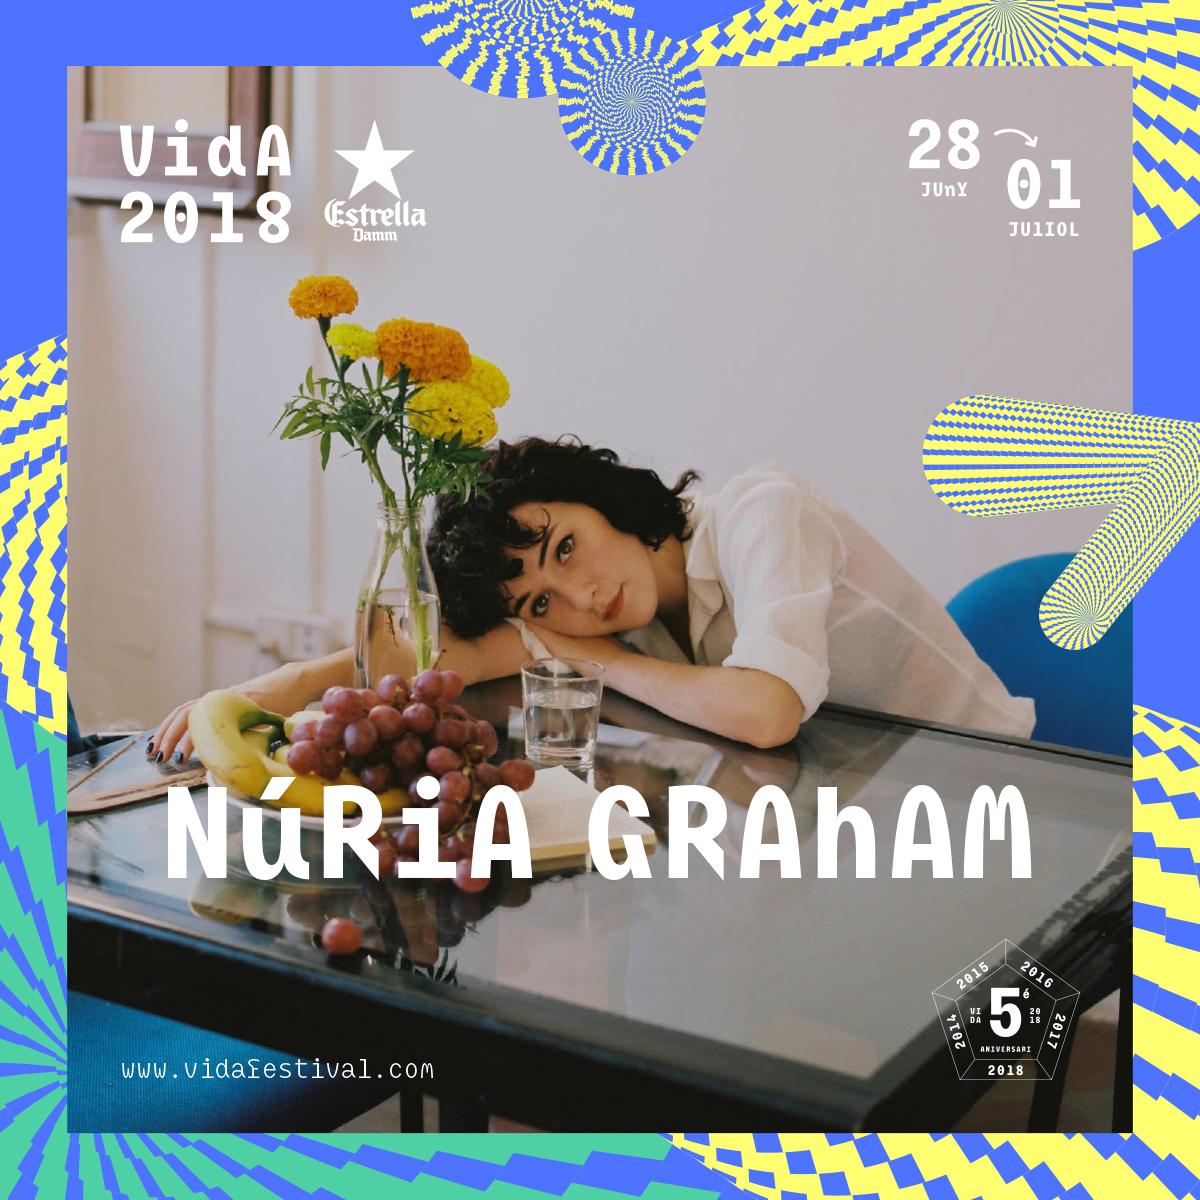 nuria-graham-1X1.jpg